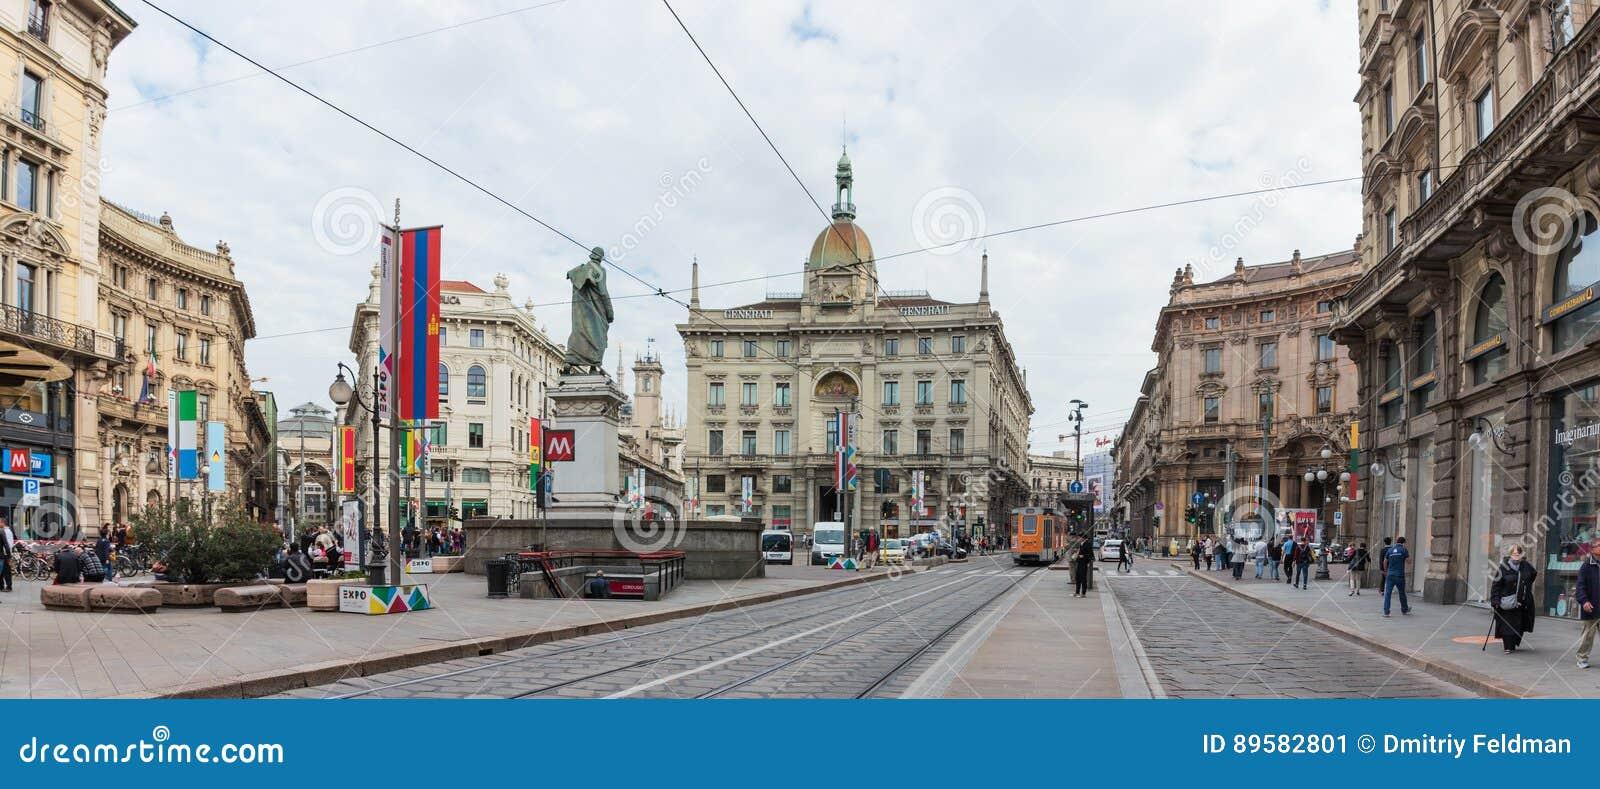 Volkeren in verfraaid Dante Avenue en Piazza Cordusio in Milaan